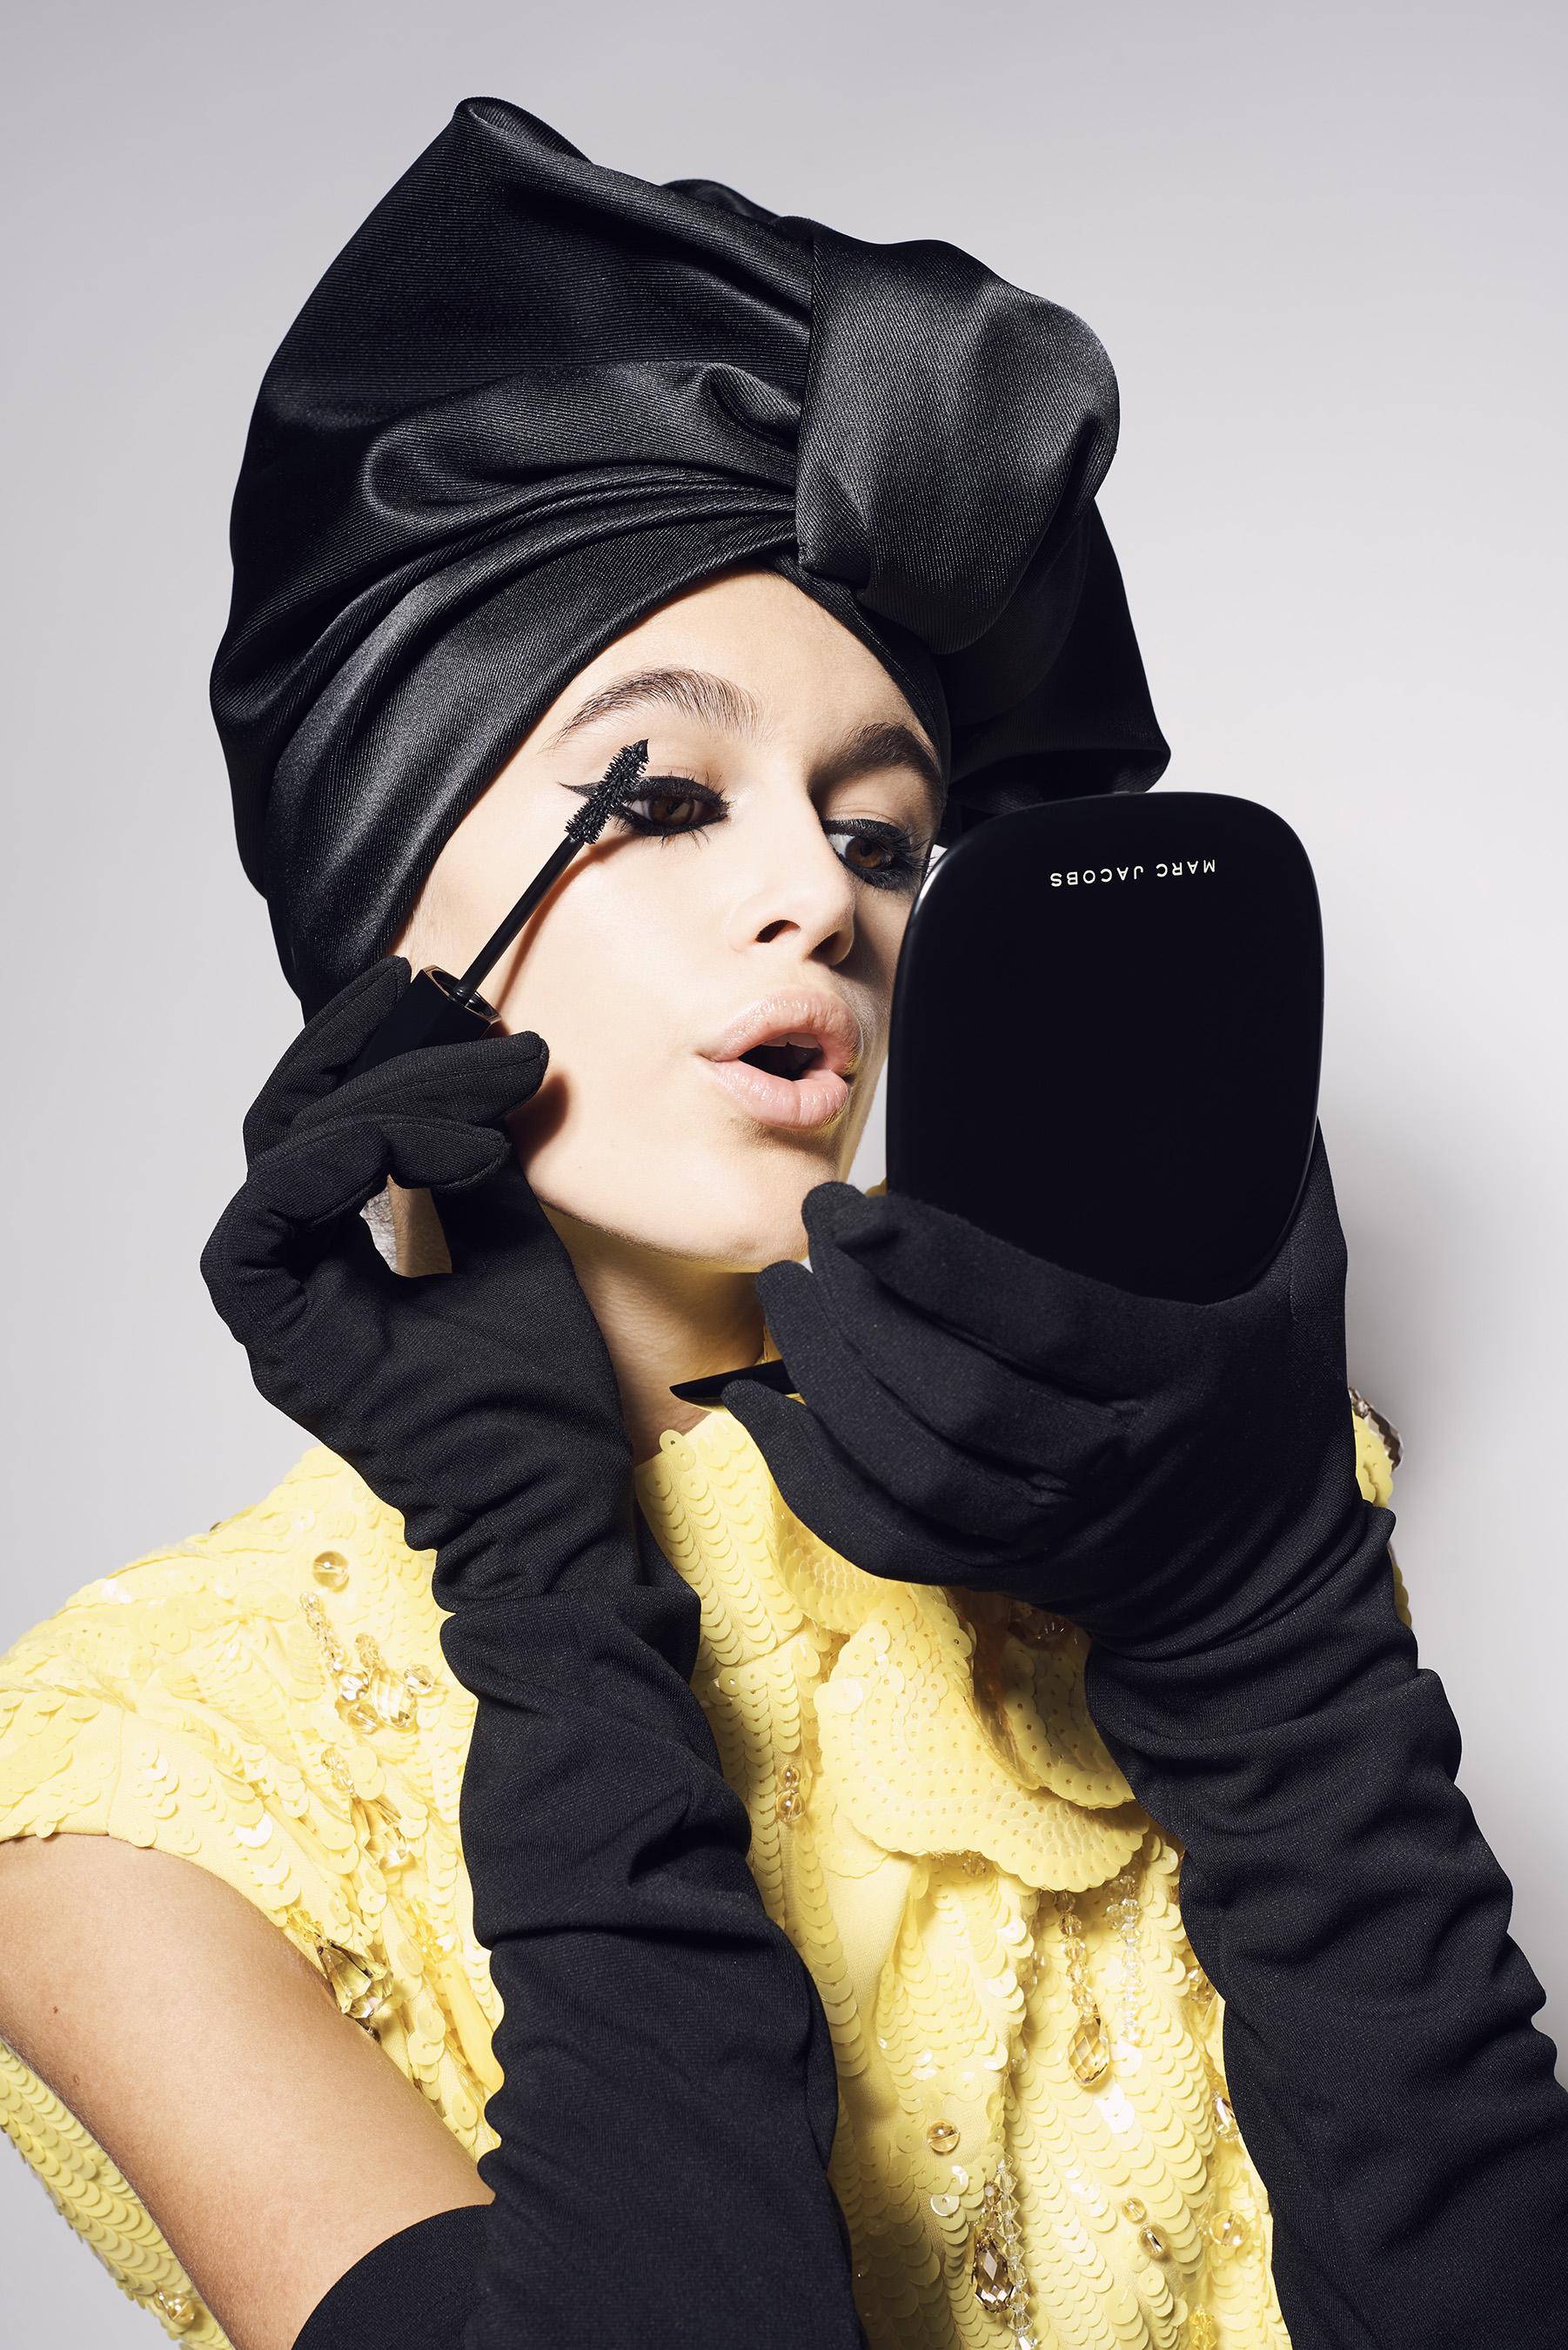 kaia gerber fronts new marc jacobs beauty campaign for velvet noir major volume mascara